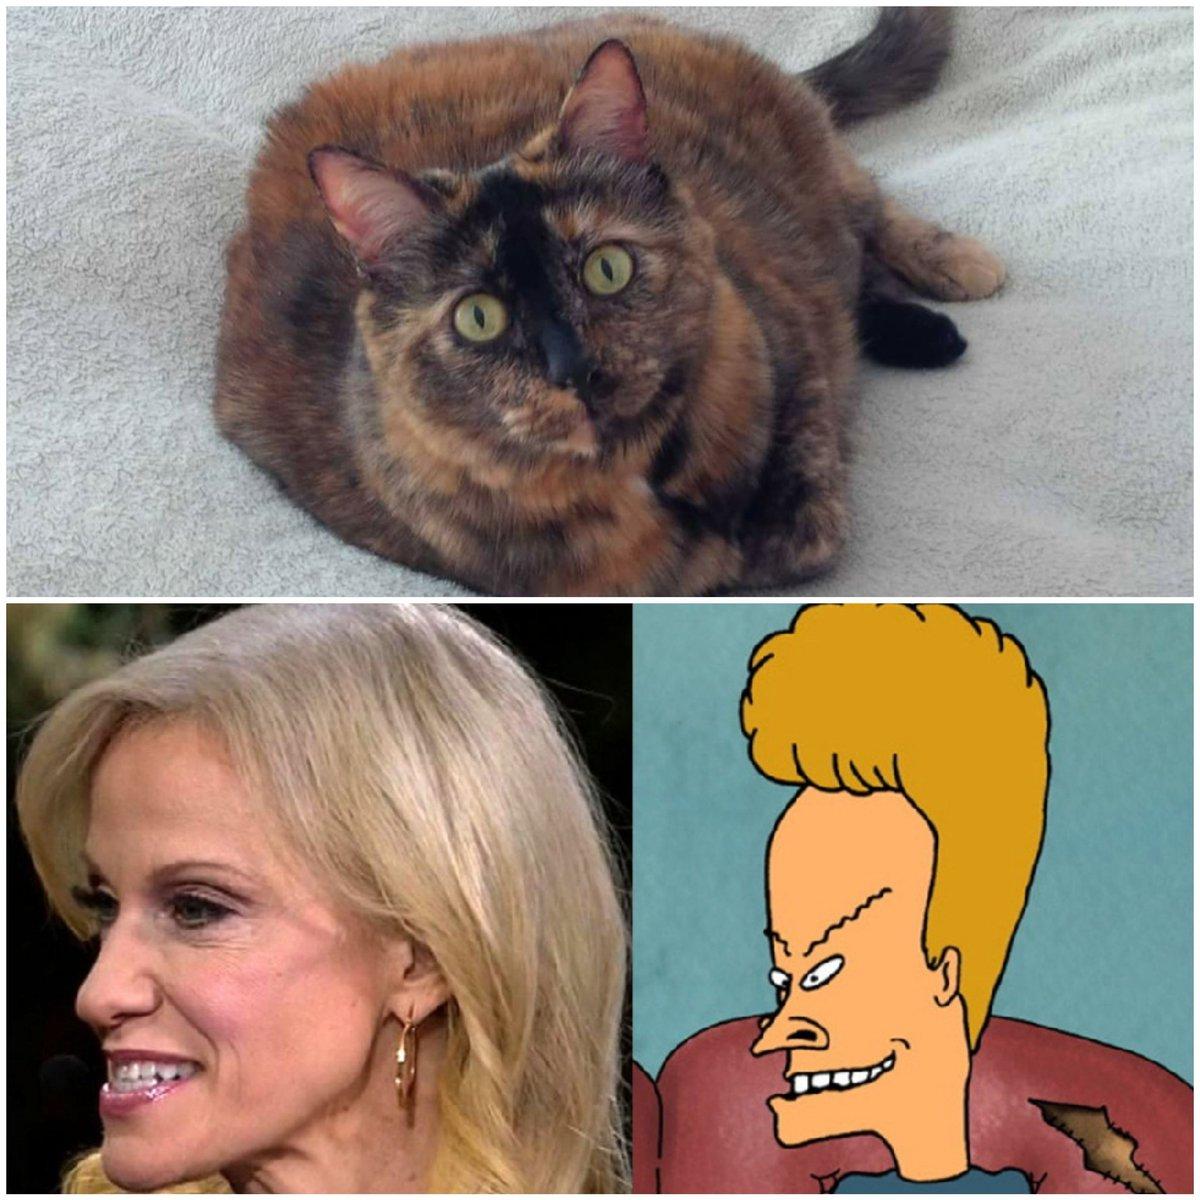 @BitchestheCat this cat also thinks Kellyanne sucks and looks likes Beavis #Catsjudgingkellyanne